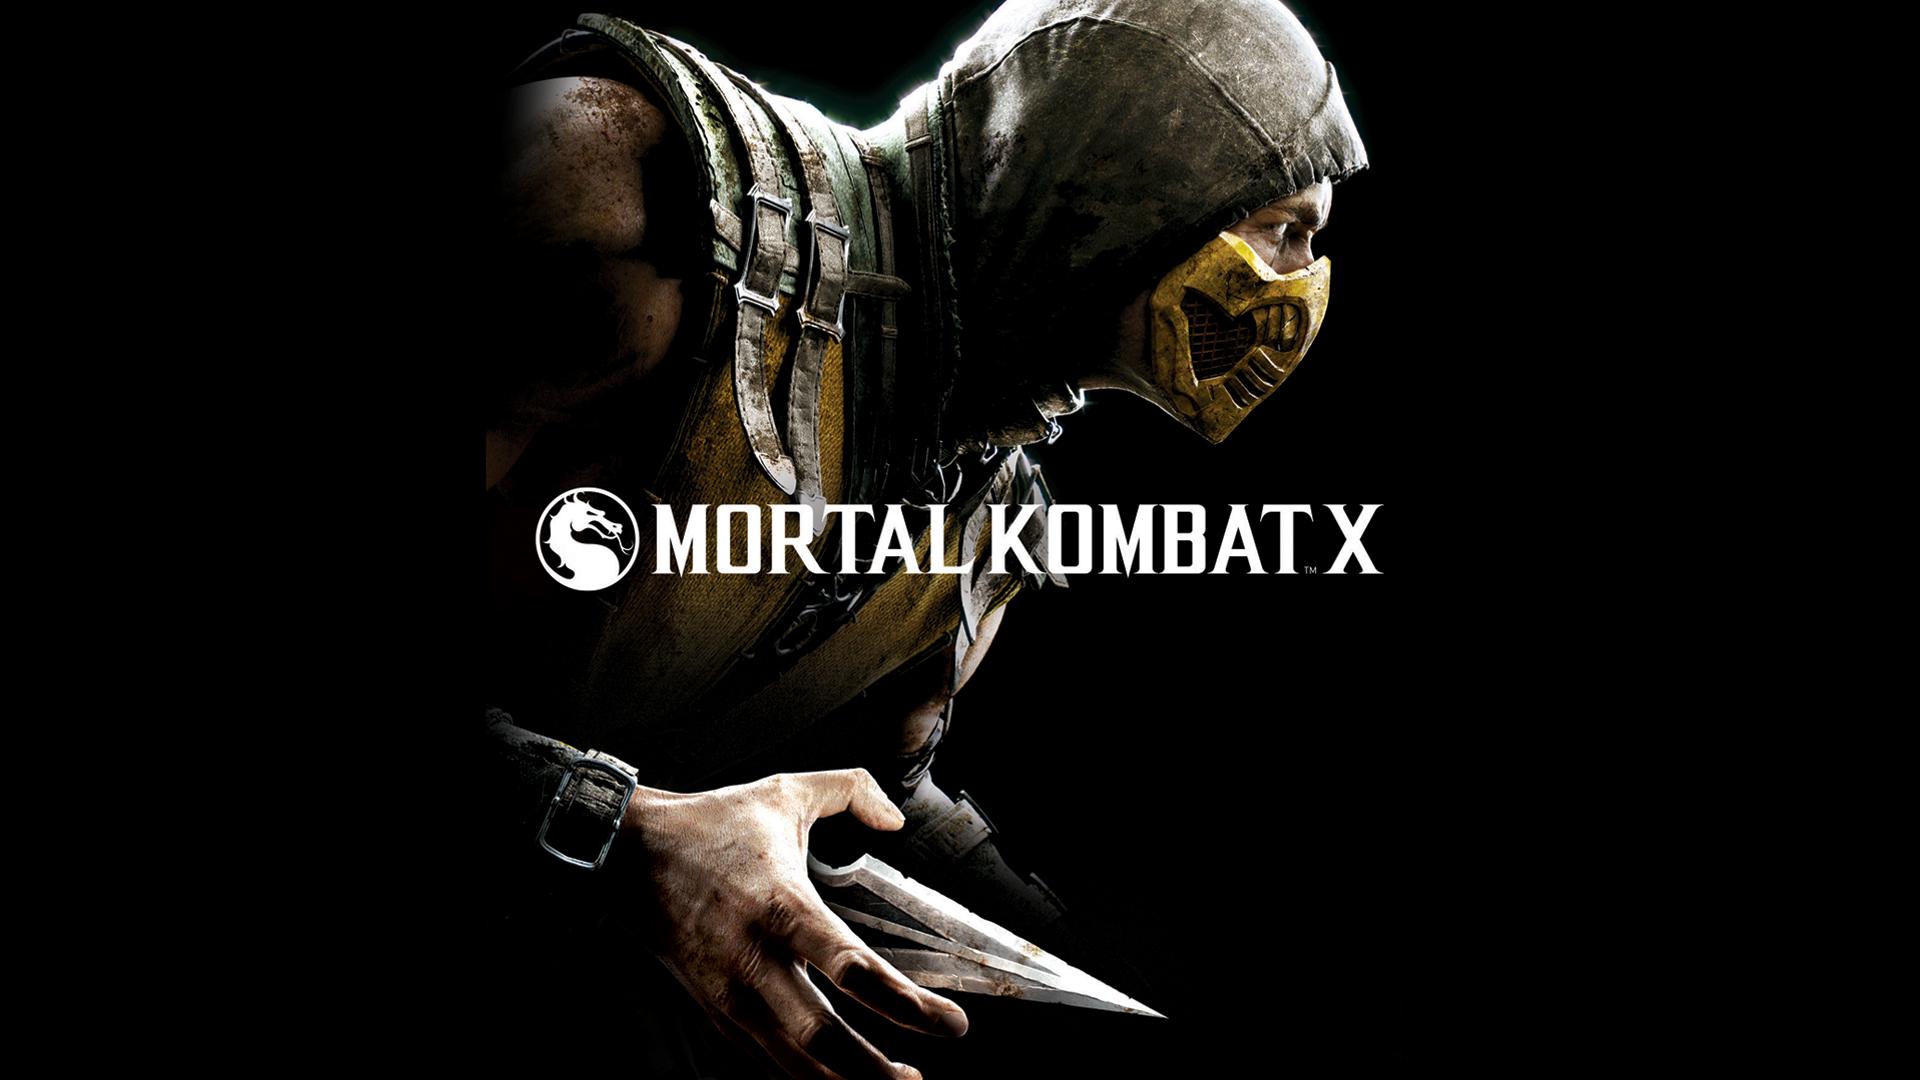 Scorpion Mortal Kombat X Game HD Wallpaper